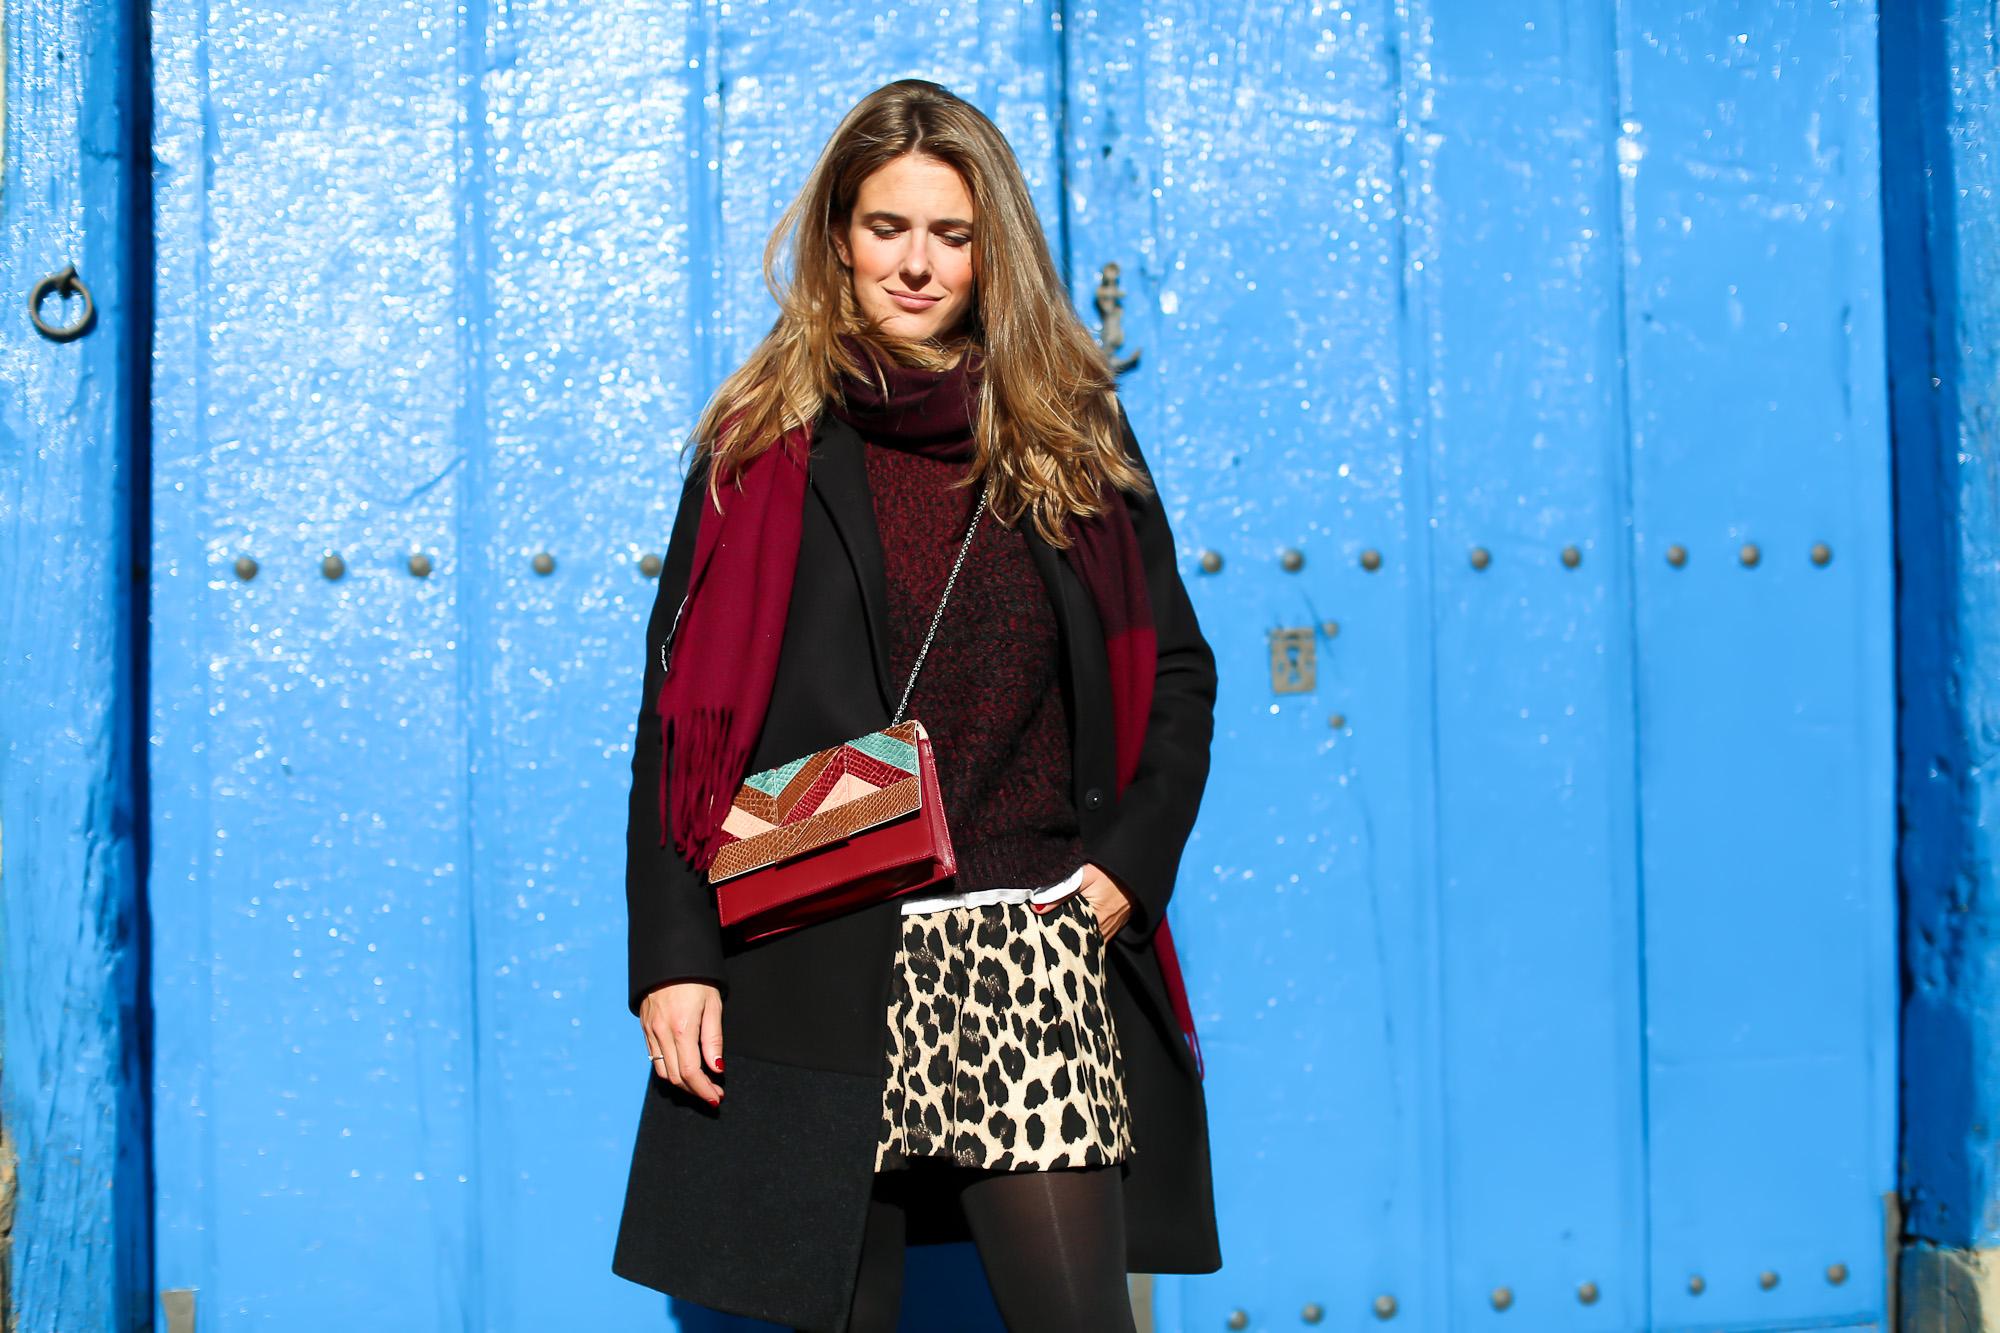 Clochet_streetstyle_fashionblogger_IKKSwoolknit_titamadridspigagranate_sandrobrogues_zaraleopardshorts-4